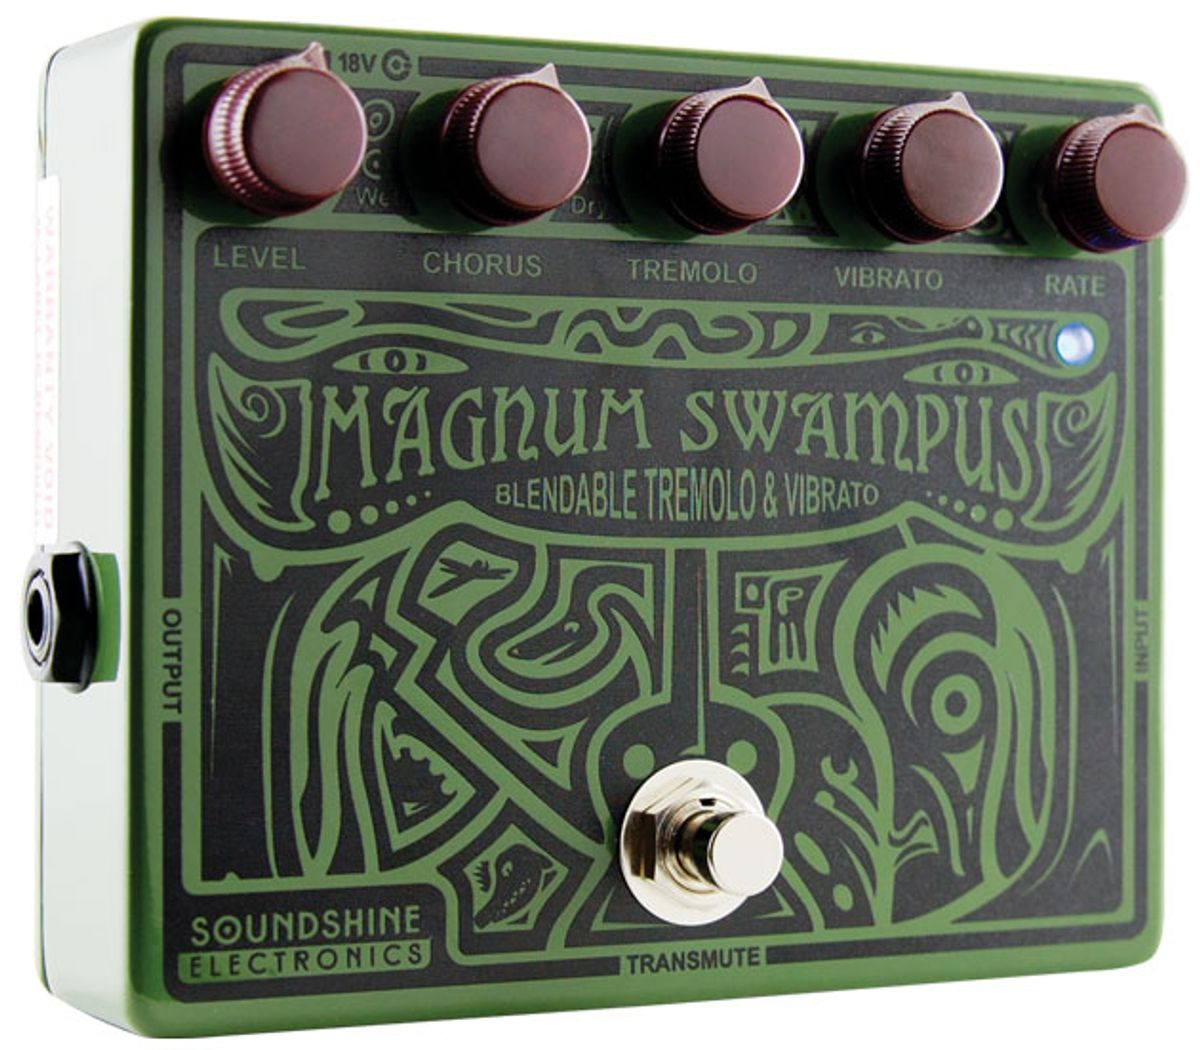 Soundshine Electronics Magnum Swampus Review